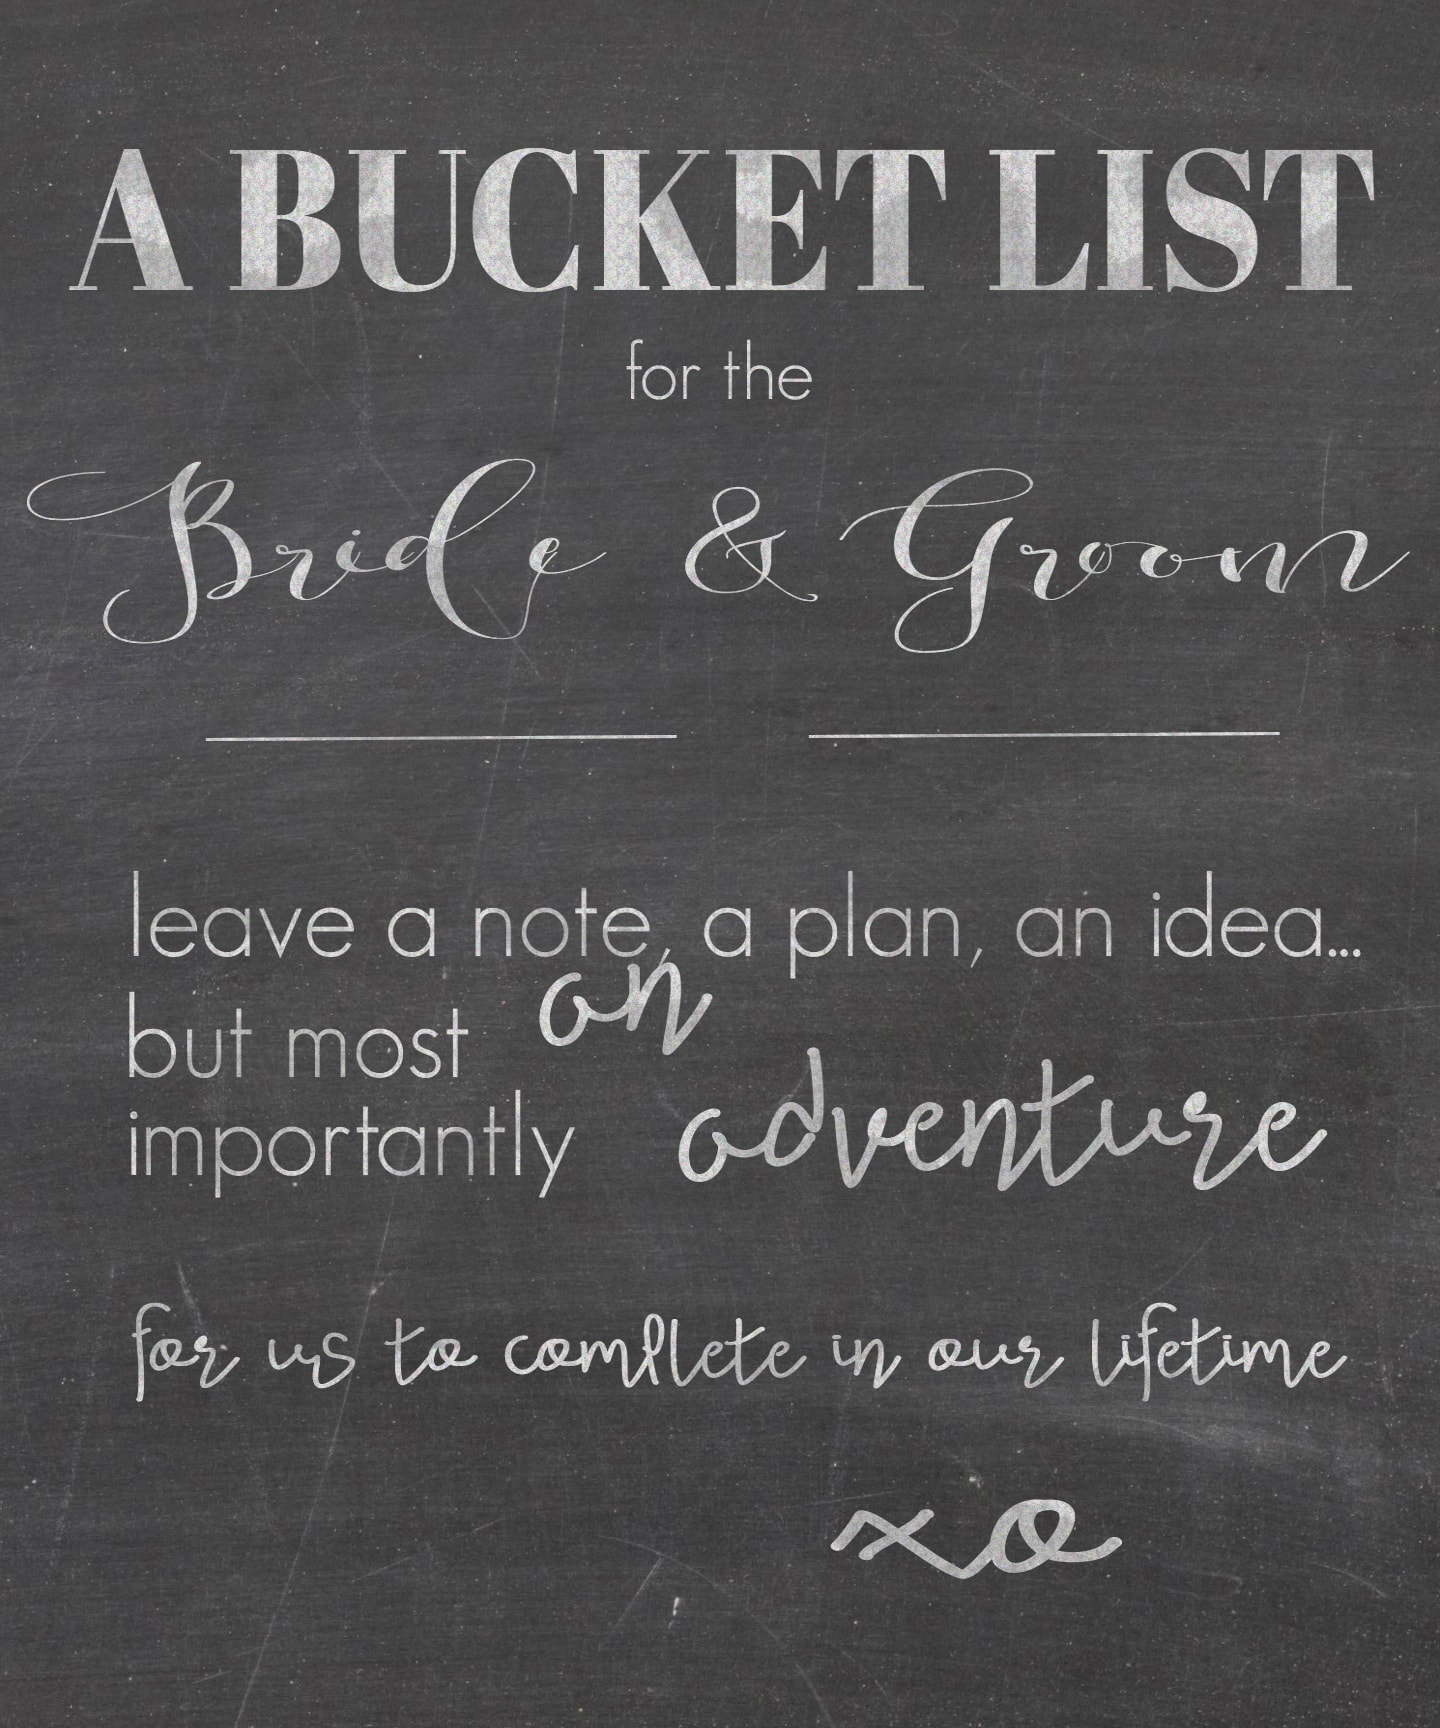 free printable!  Chalkboard sign for a bucket list in lieu of a guest book | maisondepax.com